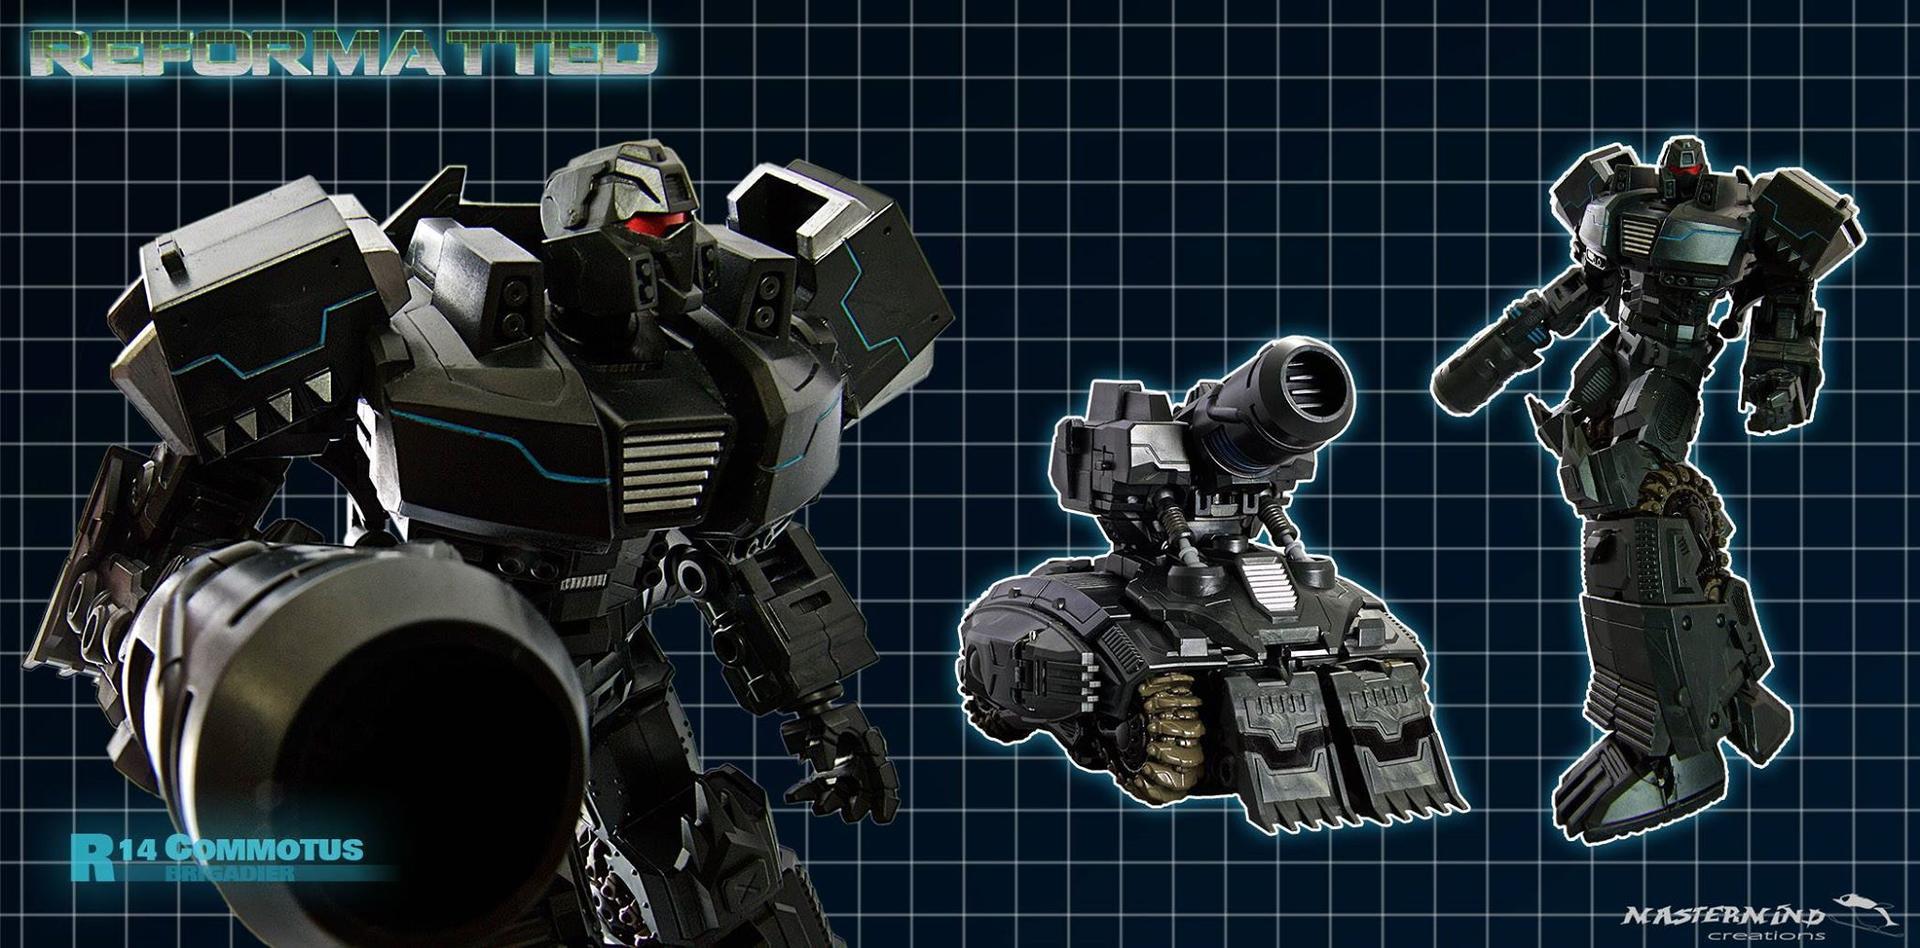 [Mastermind Creations] Produit Tiers - Reformatted R-13 Spartan (aka Impactor) des Wreckers + R-14 Commotus (aka Turmoil) - IDW R2DKf7zE